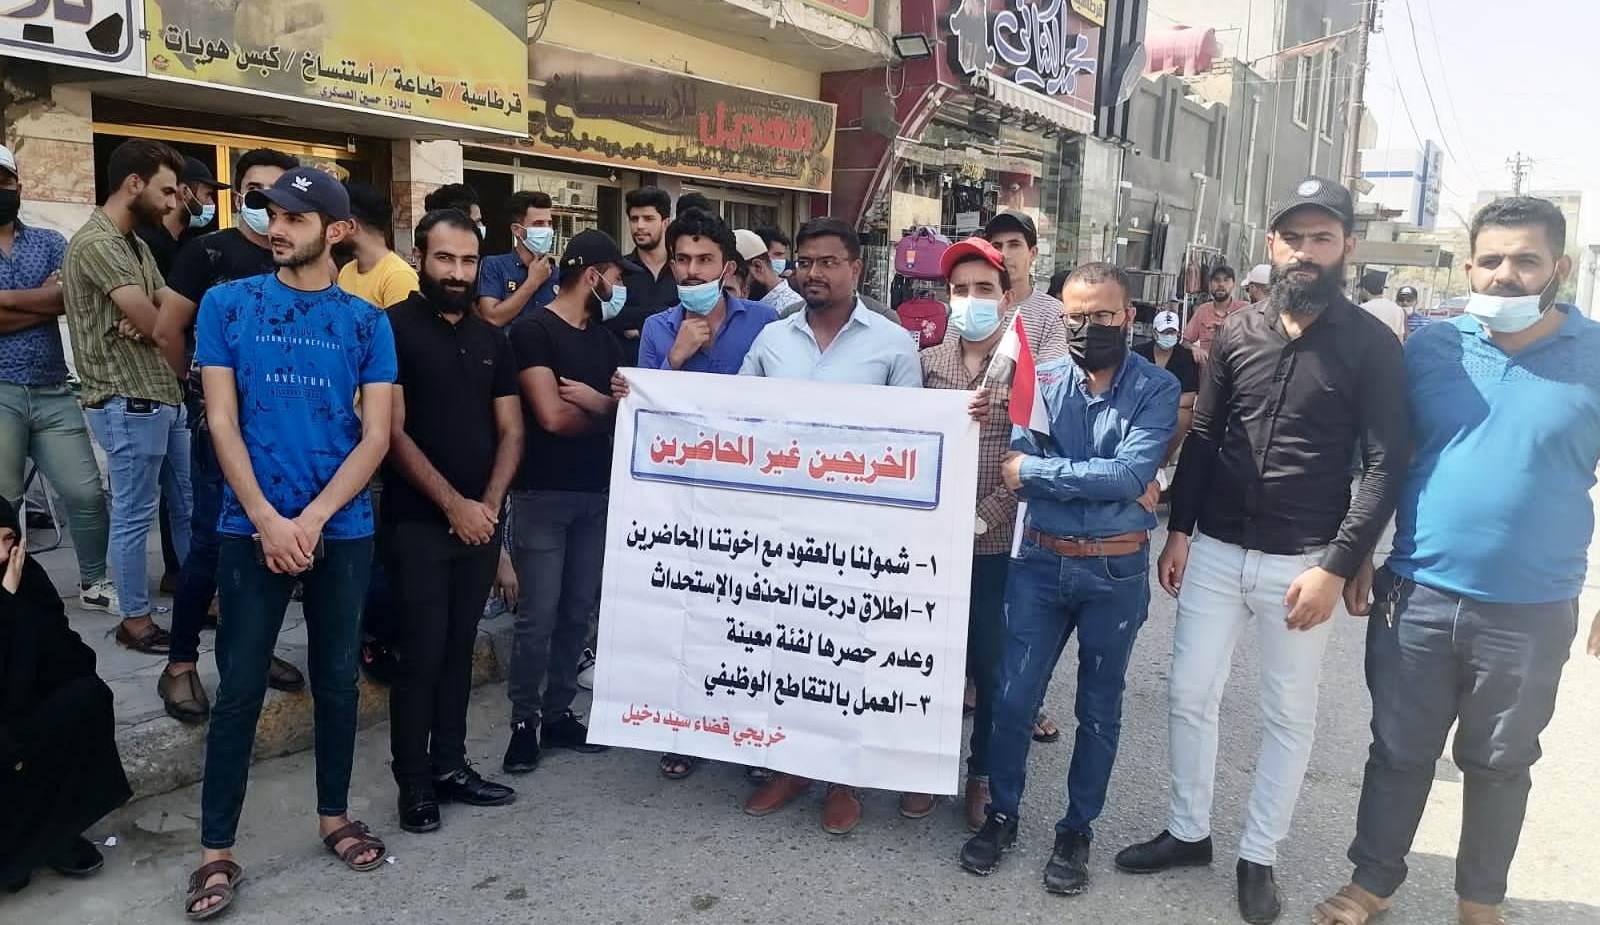 Three demonstrations in Dhi Qar this morning